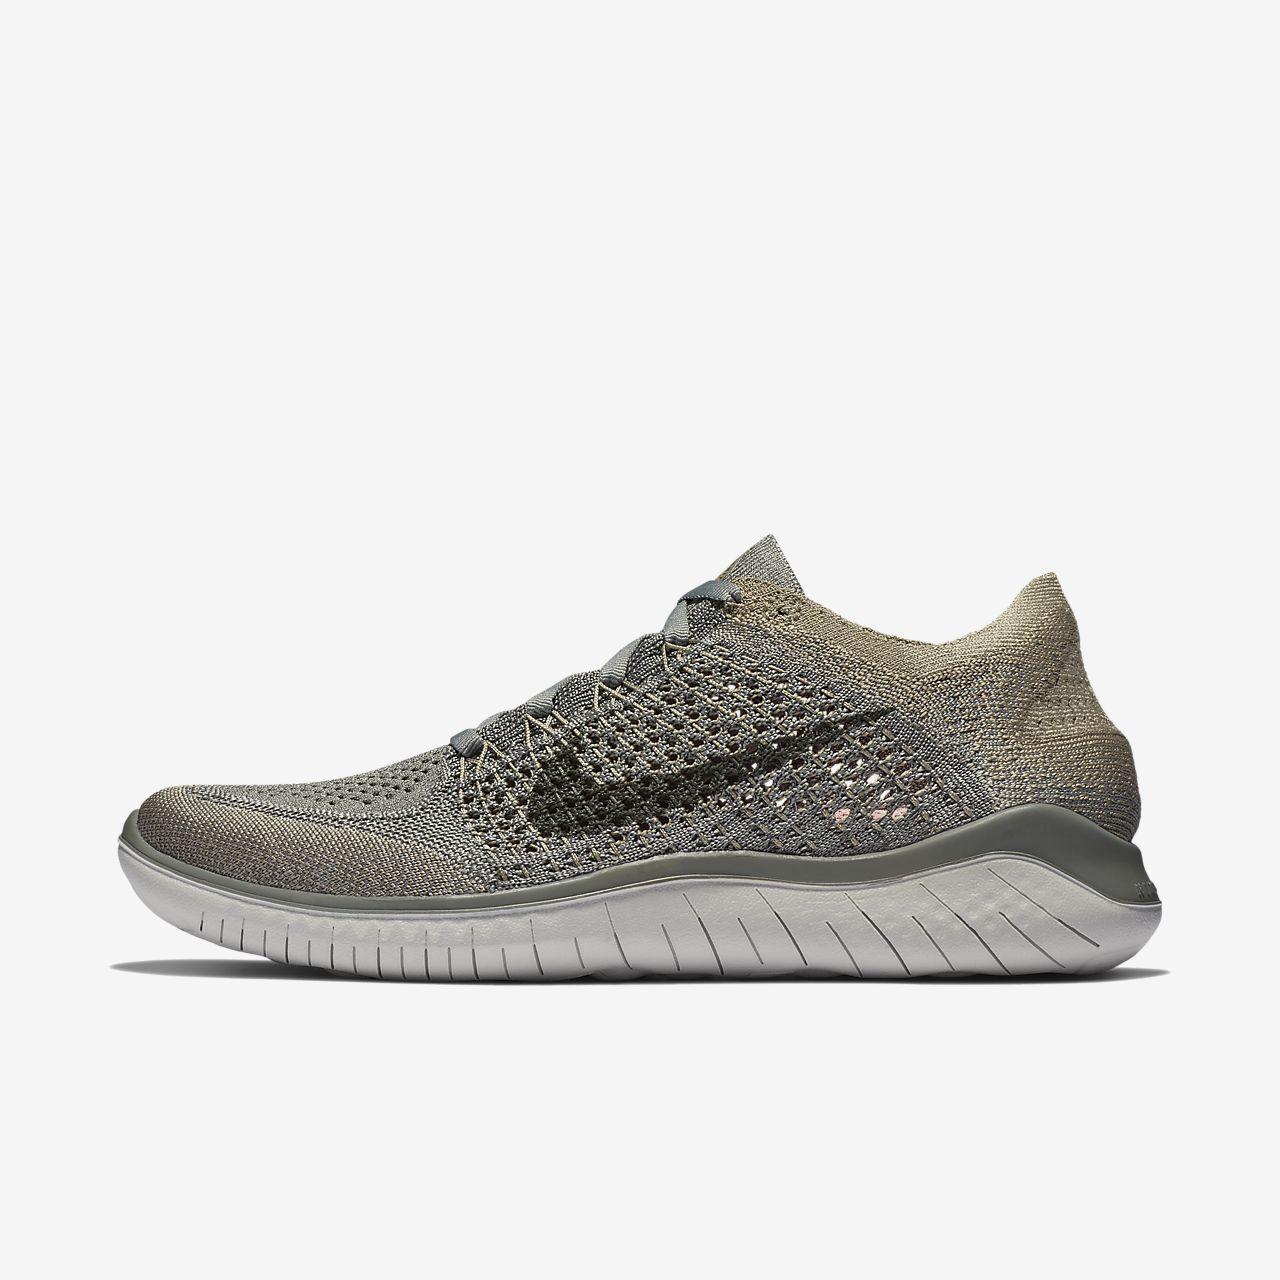 Wmns Nike Libre Rn Flyknit 2017 - Chaussures Pour Les Hommes / Gris Nike 1EJxMU9kFQ